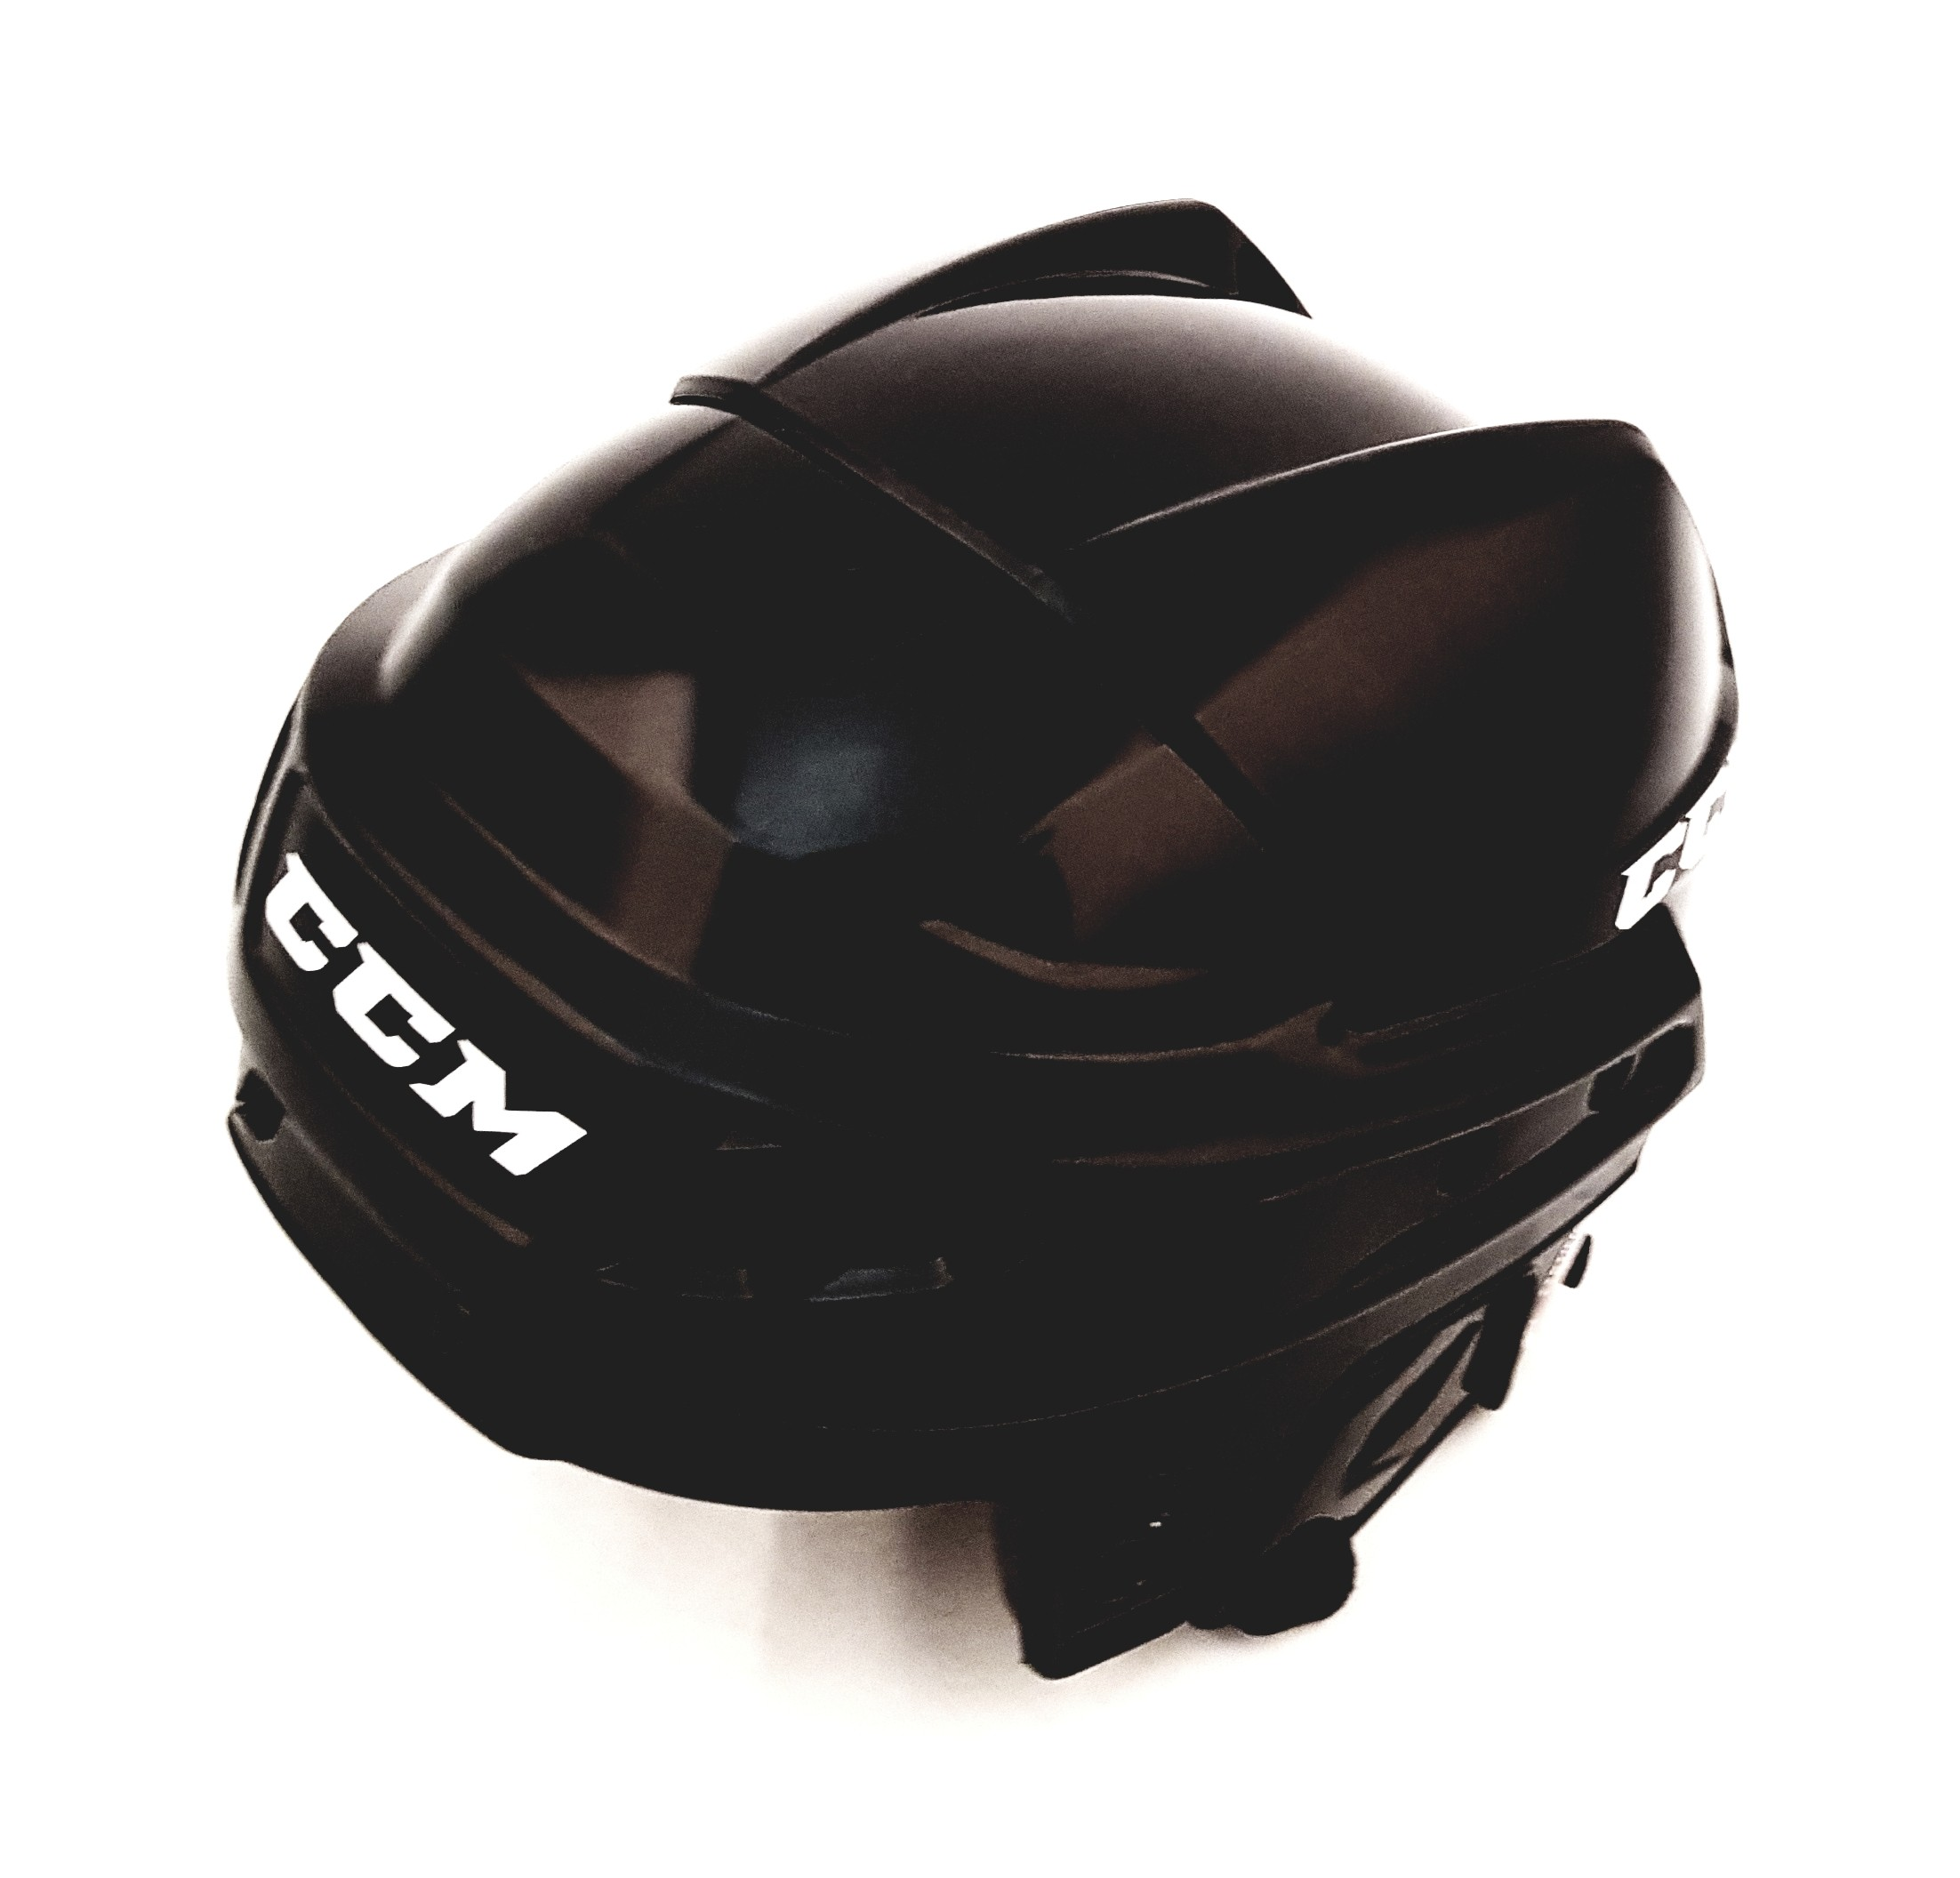 CCM Vector 04 Hockey Helmet